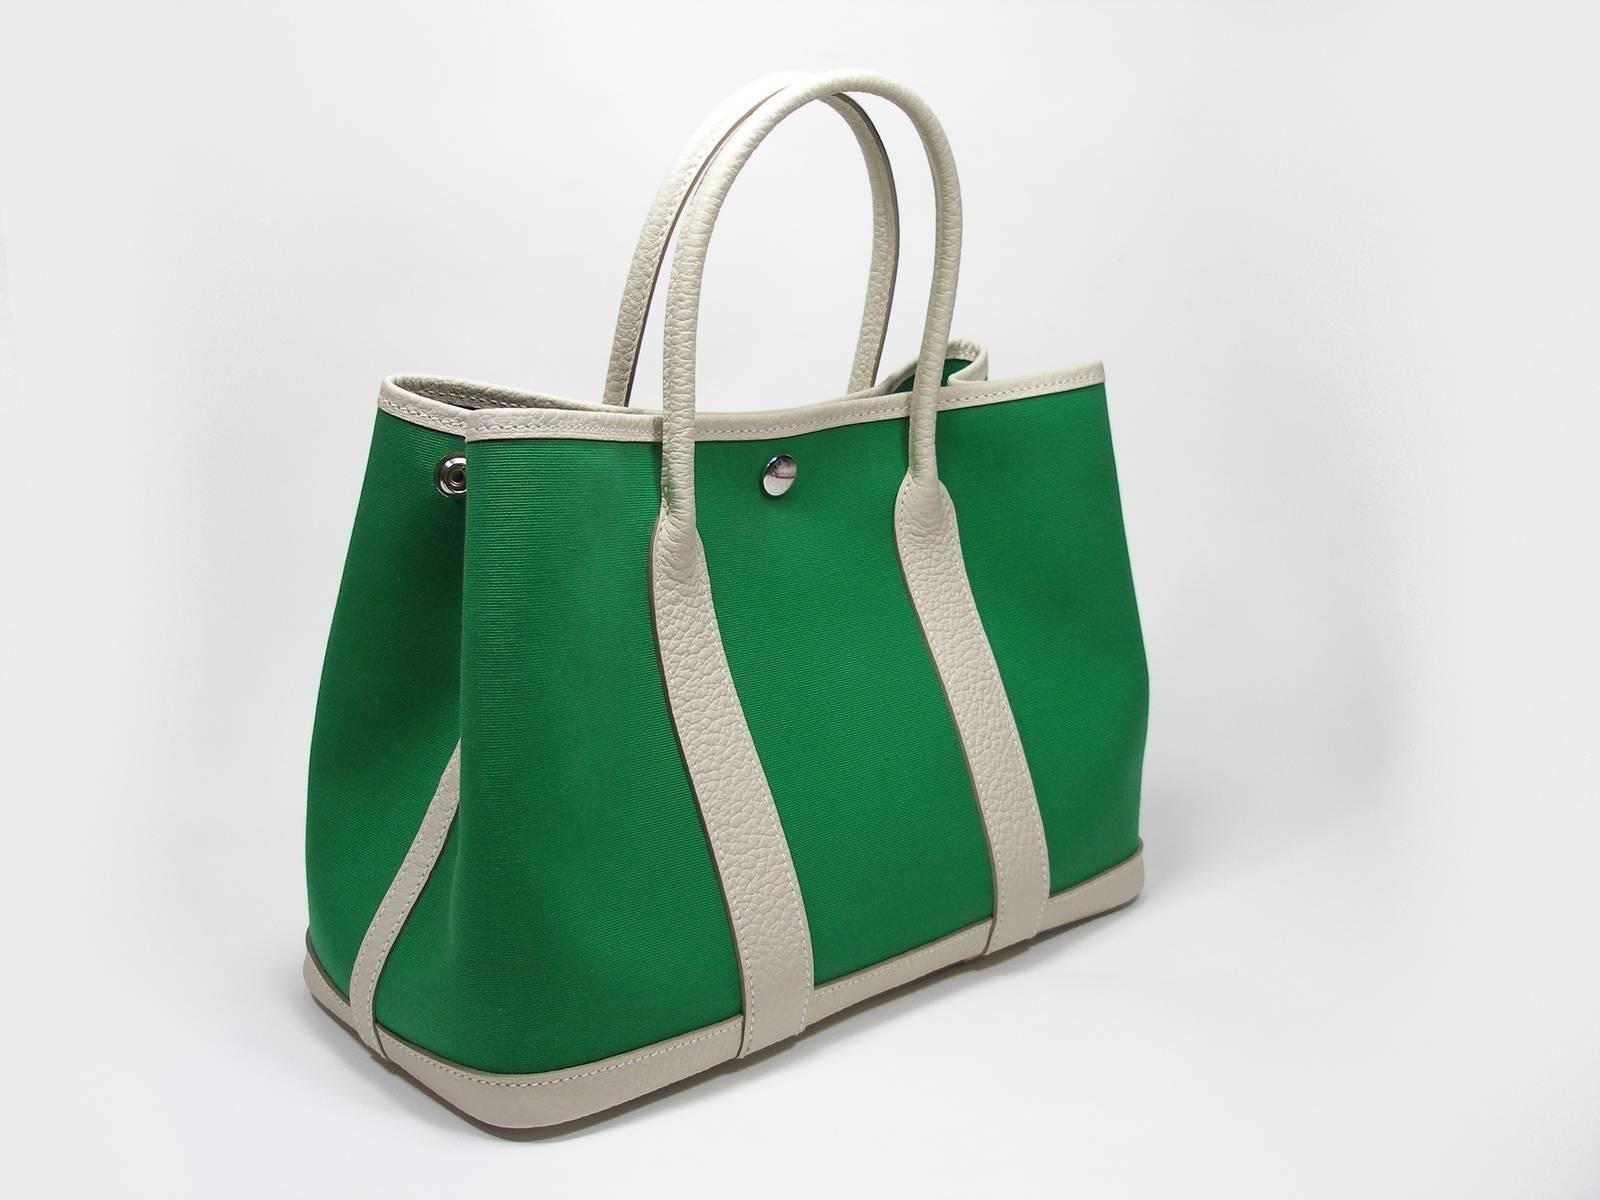 0bdaa73dda06 Hermès Garden Party Bag 30 cm PM Size Cactus Canvas + Craie Leather at  1stdibs